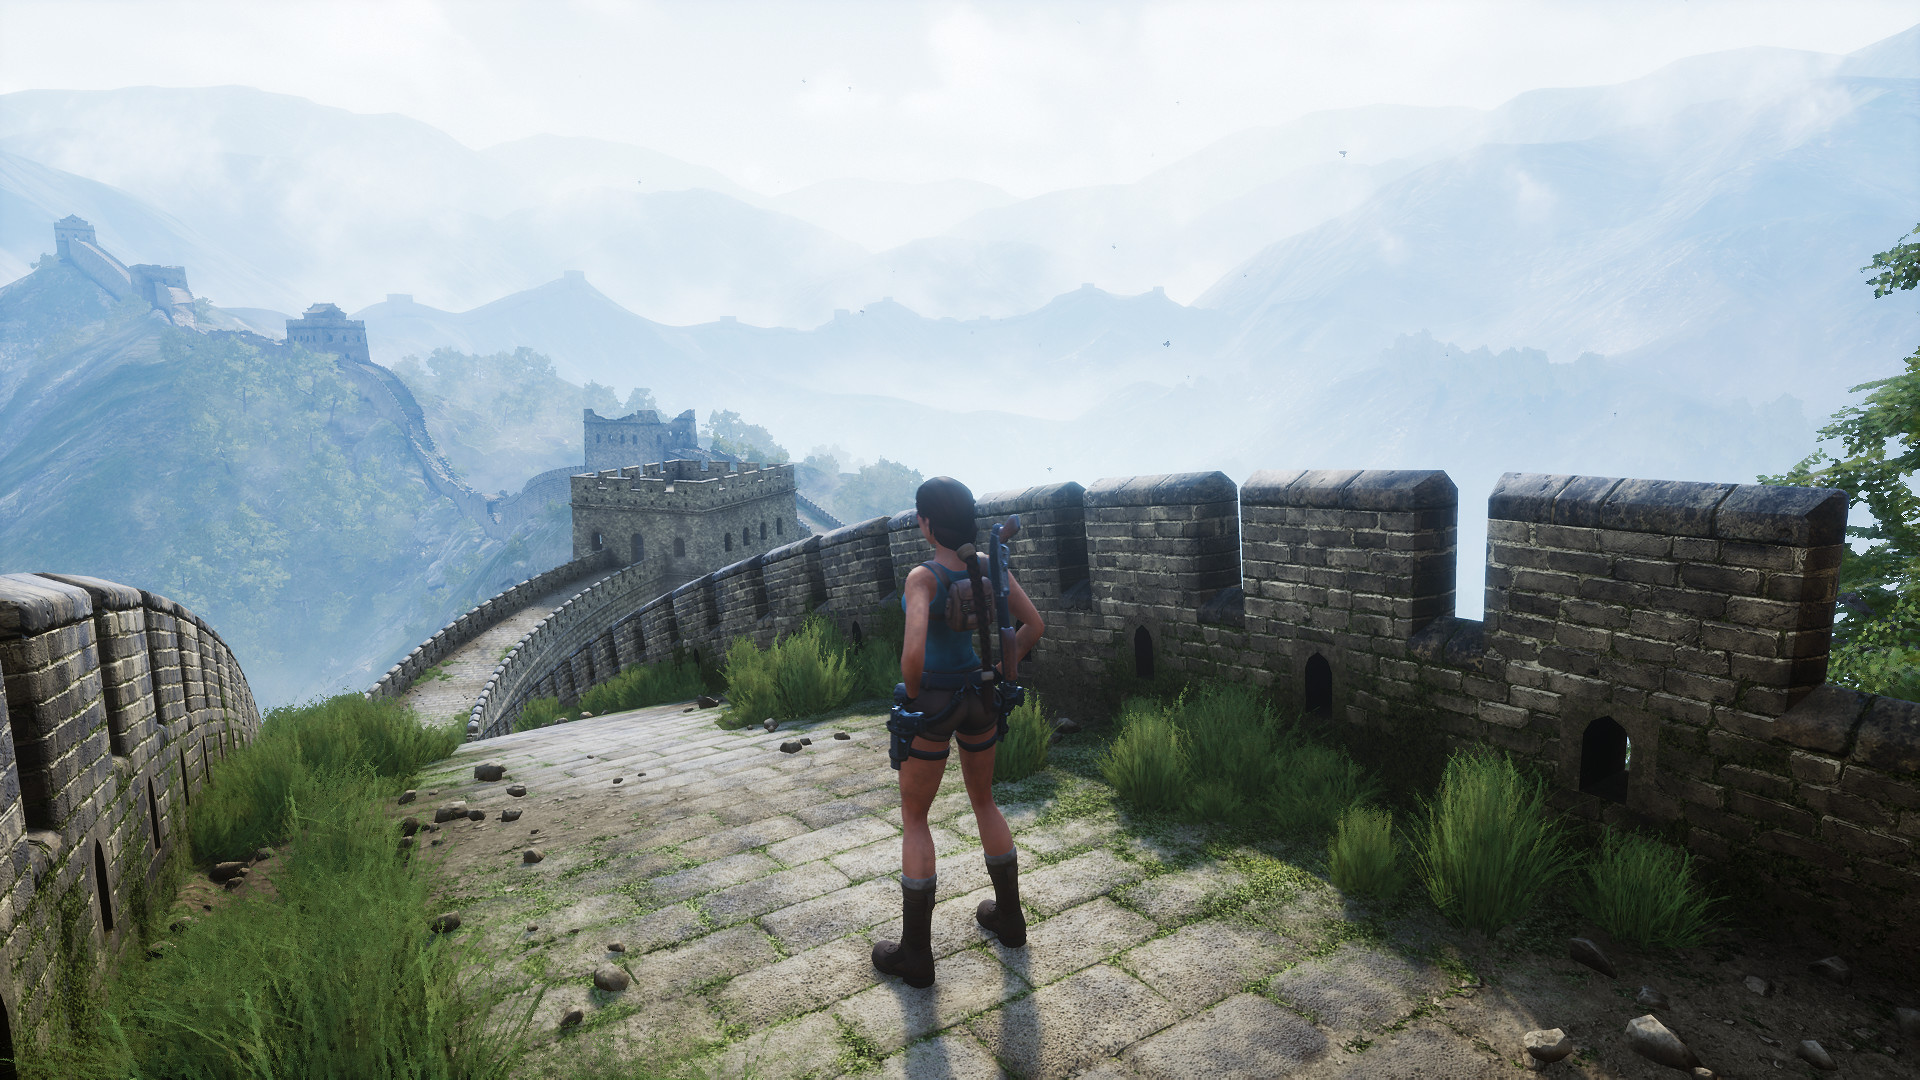 Screenshot 1 - Tomb Raider: The Dagger of Xian (DOX)